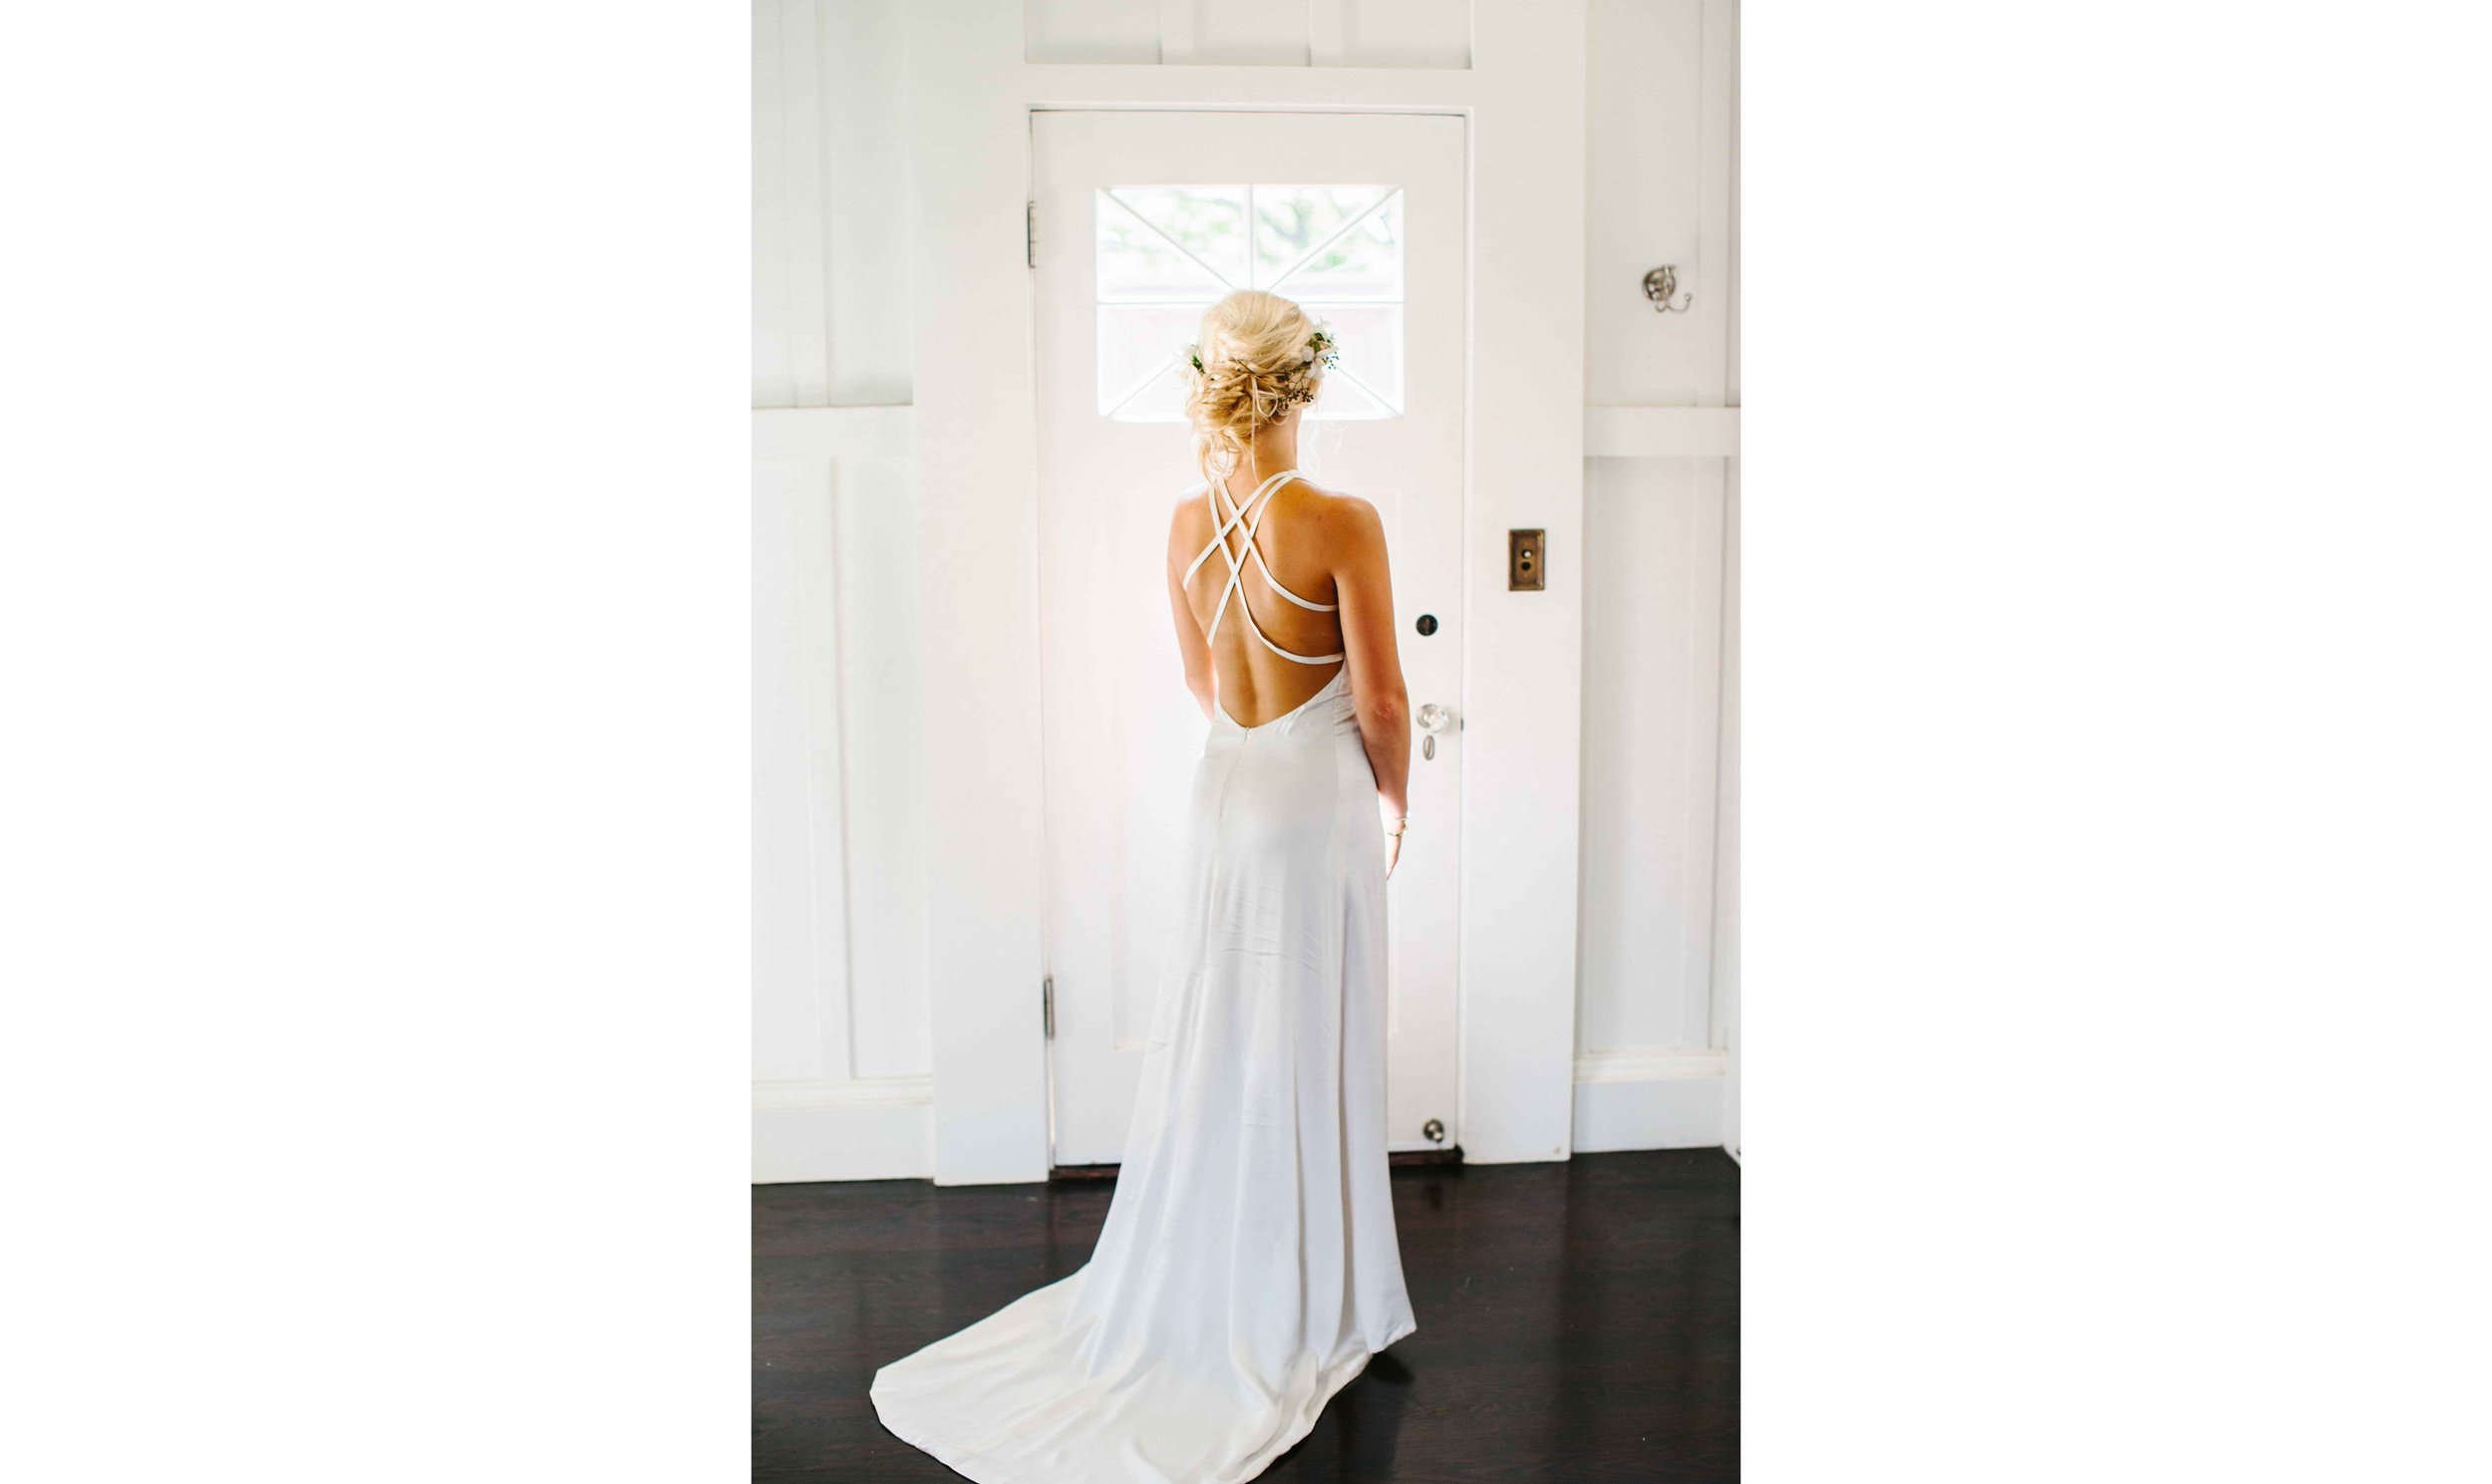 Beauty Bridal dress Oahu Wedding Photographer